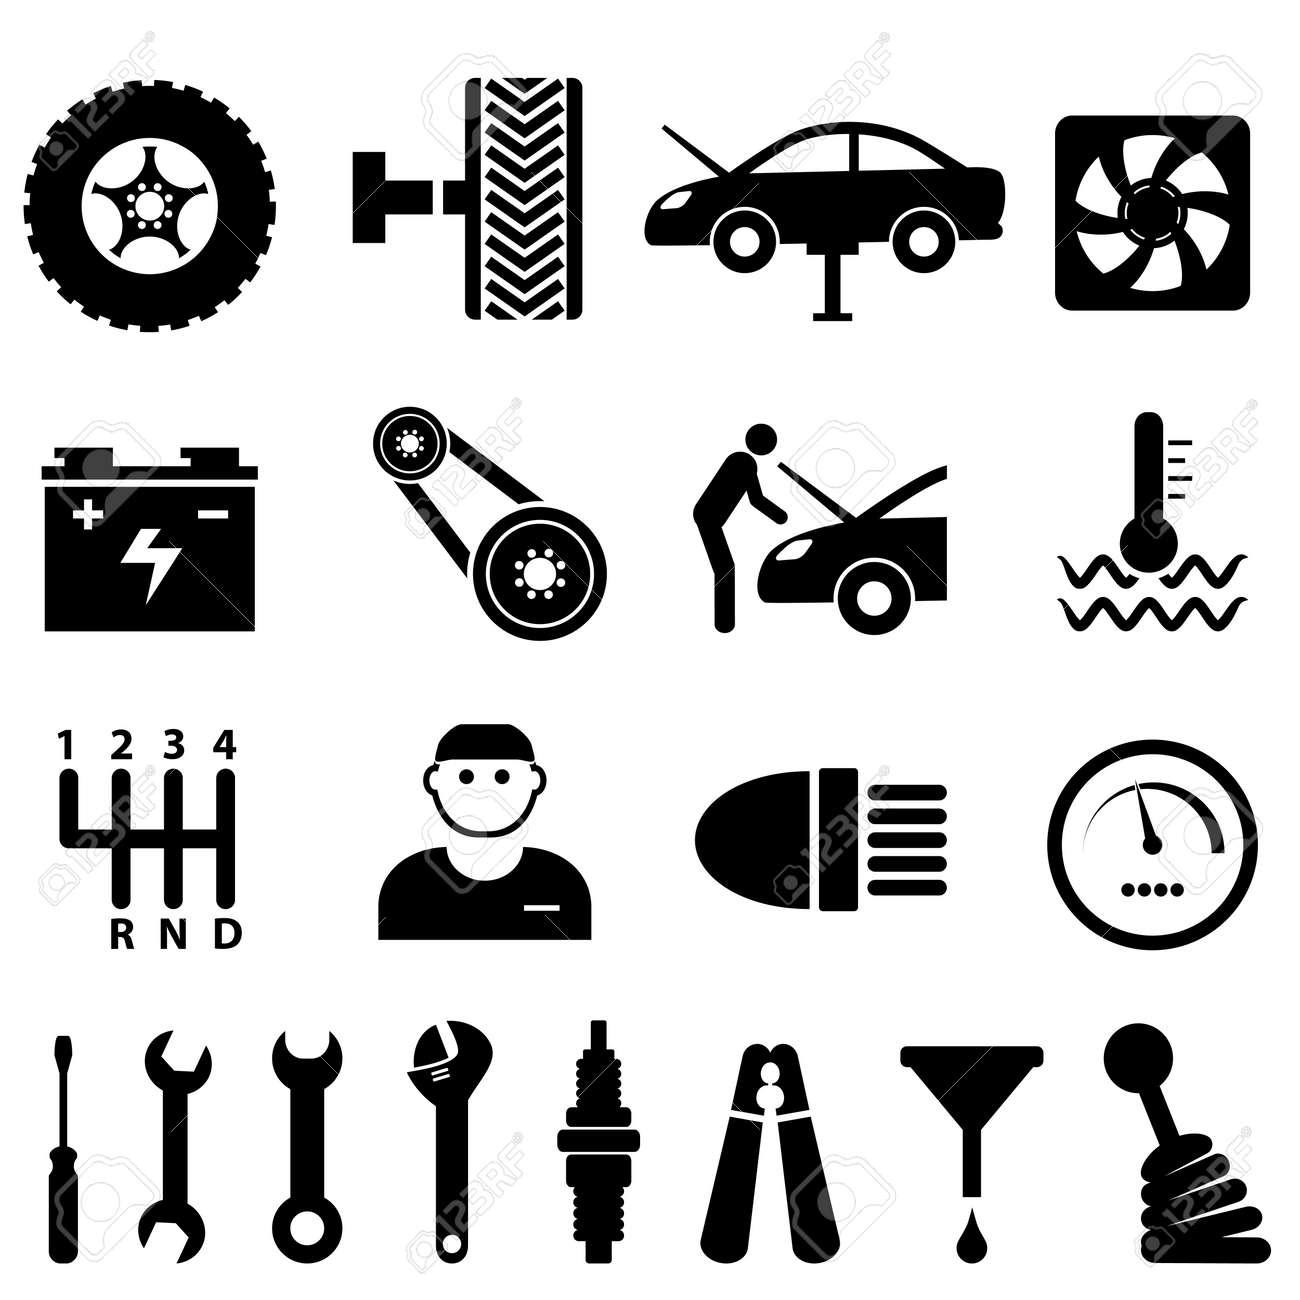 Car maintenance and repair icon set - 15805076